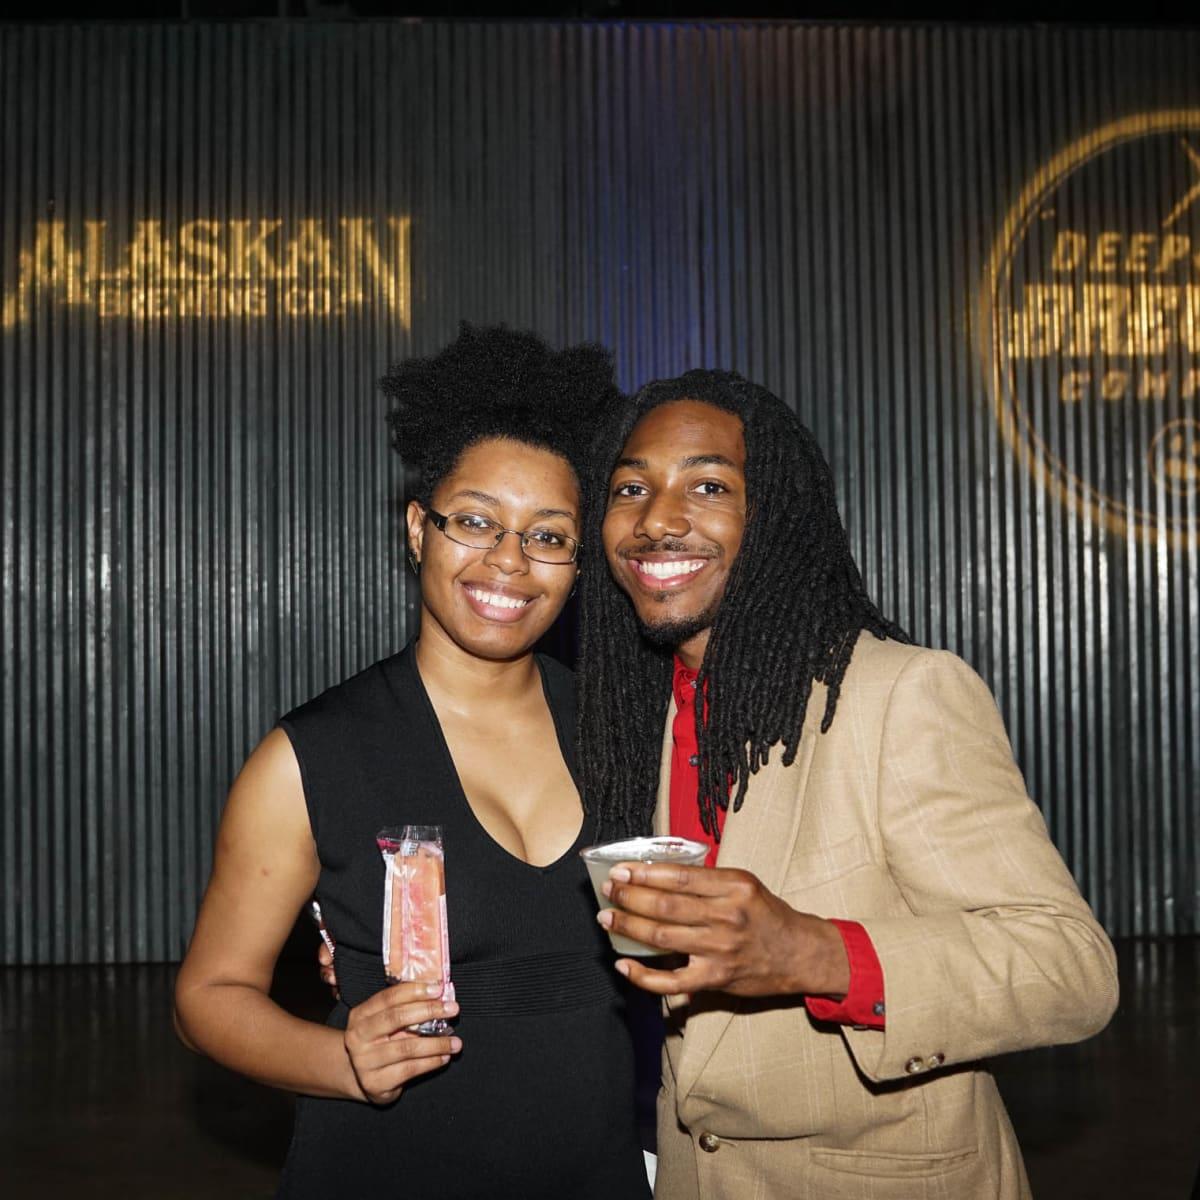 CultureMap Austin 2018 Tastemaker Awards at Fair Market Caress Houston Avery Scott